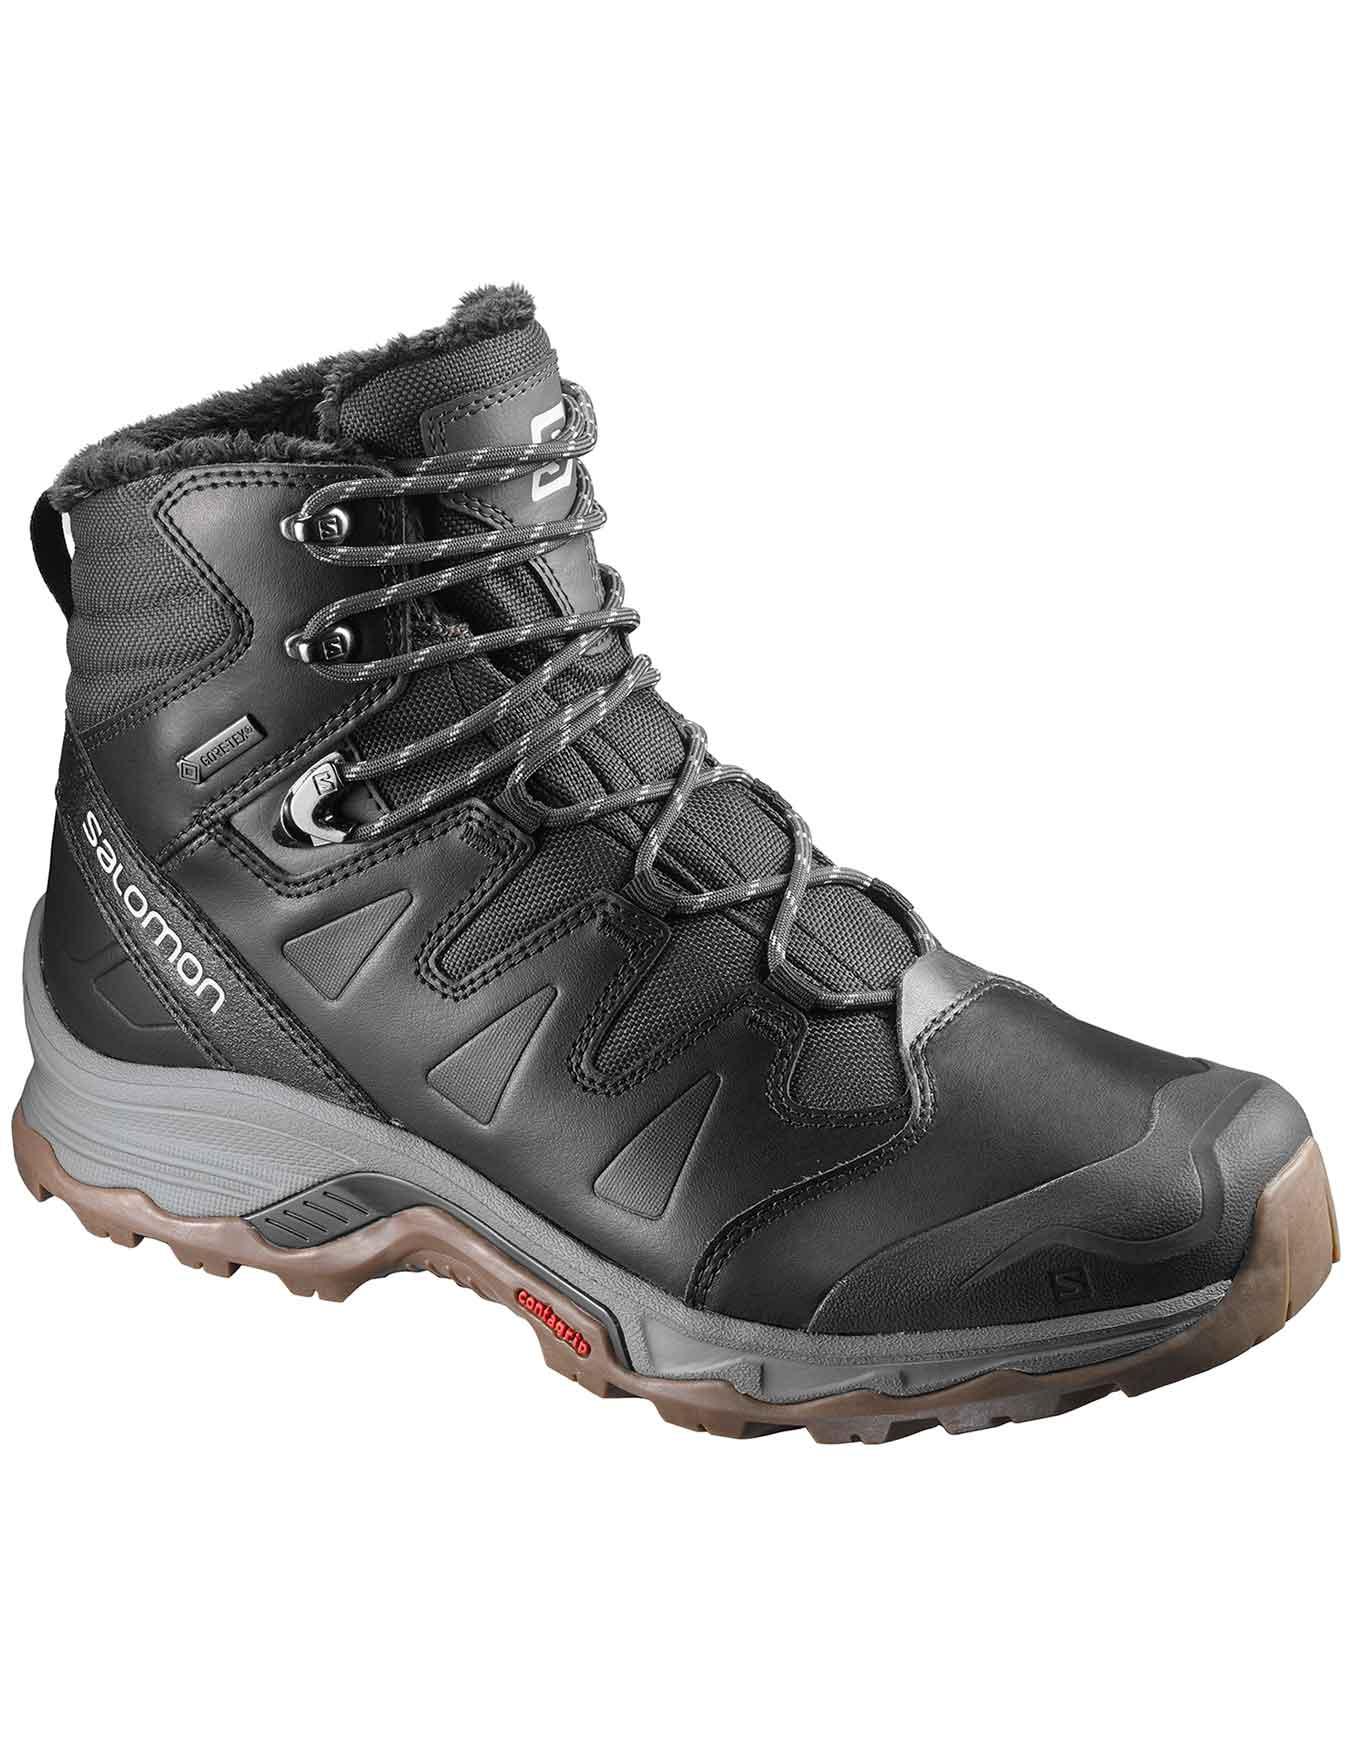 Quest Chaudes Winter Marche Phantombkvapo Salomon Gtx Chaussures rnr17wWx